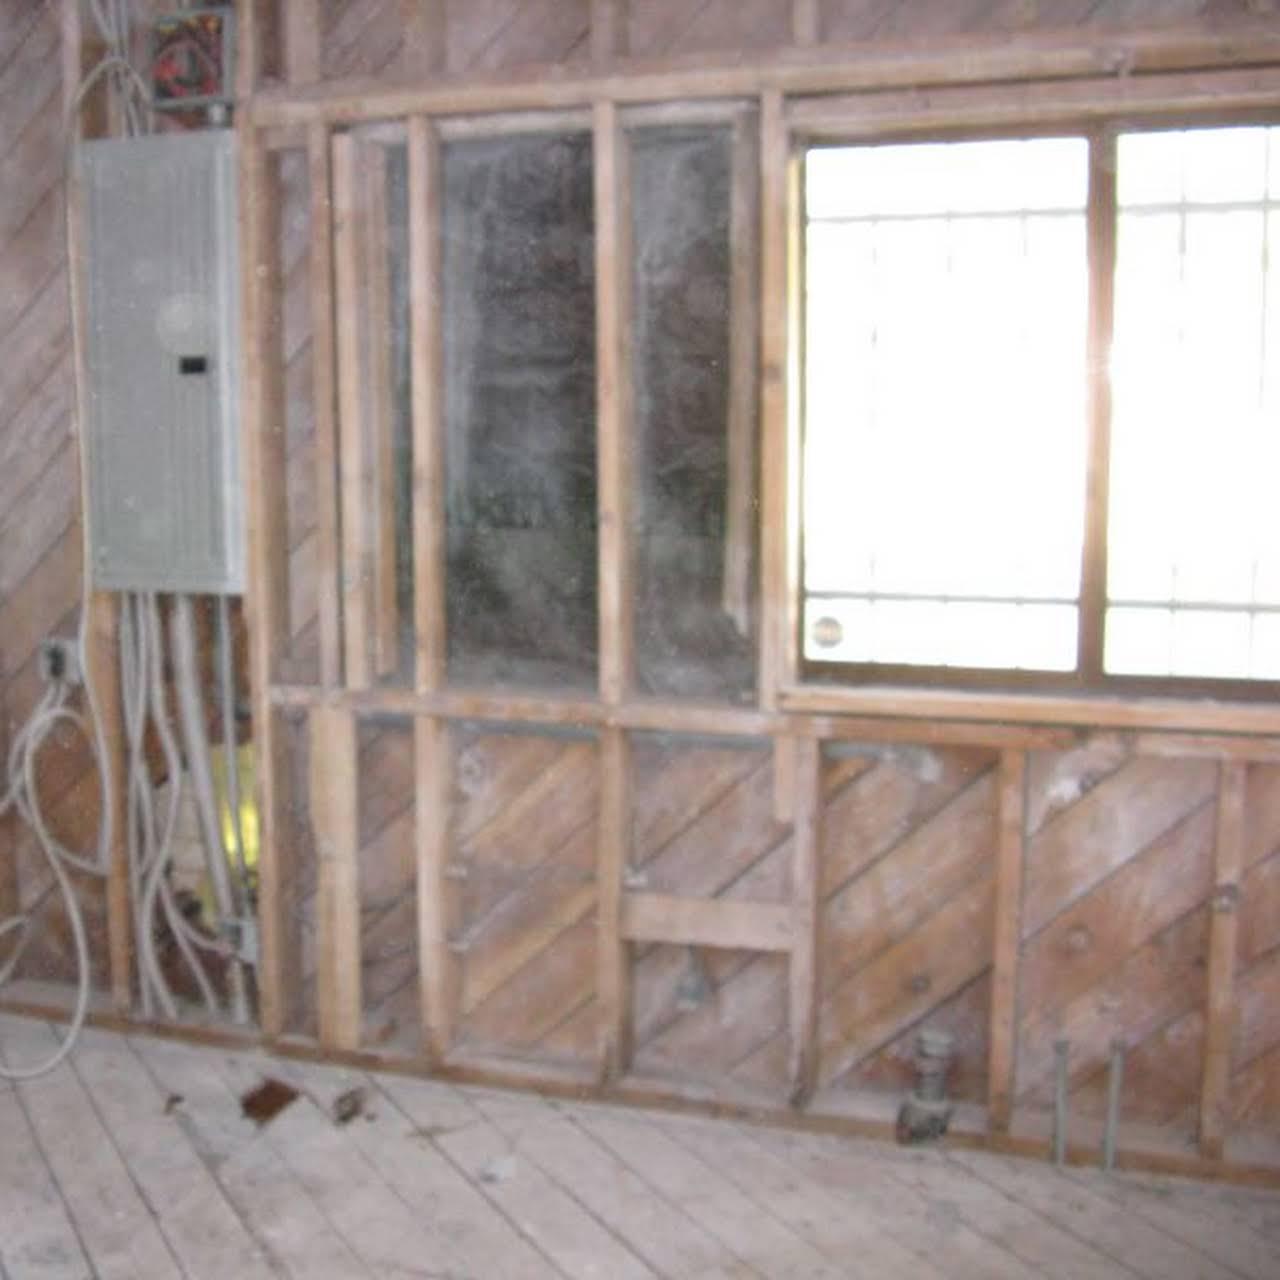 Santa Ana Mold Removal - Water Damage Restoration Service